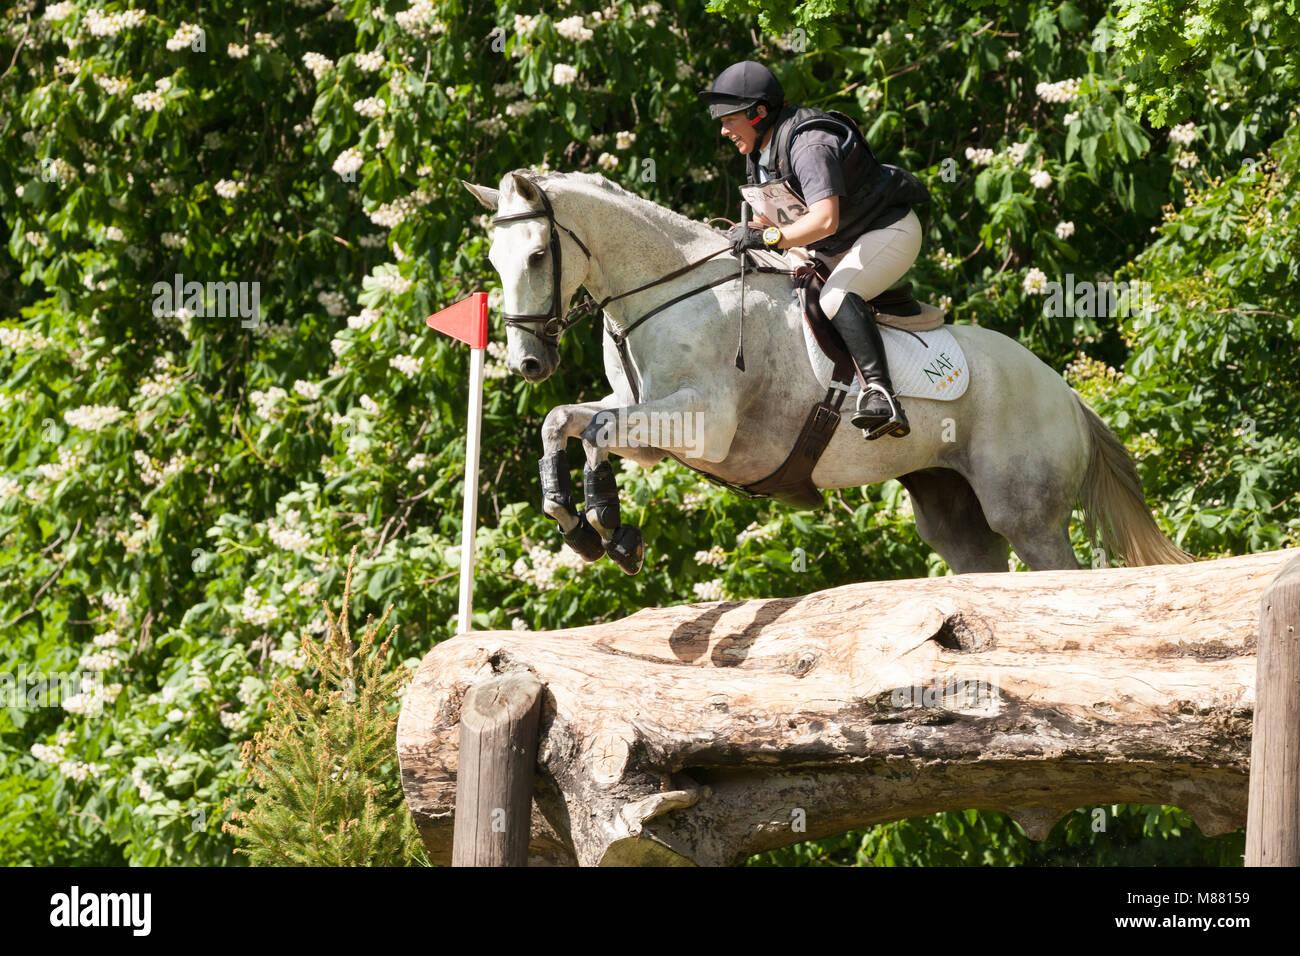 HOUGHTON, NORFOLK/ENGLAND - May 27th 2017: Houghton International Horse Trials 2017 Rosie Thomas riding Heat Wave. - Stock Image